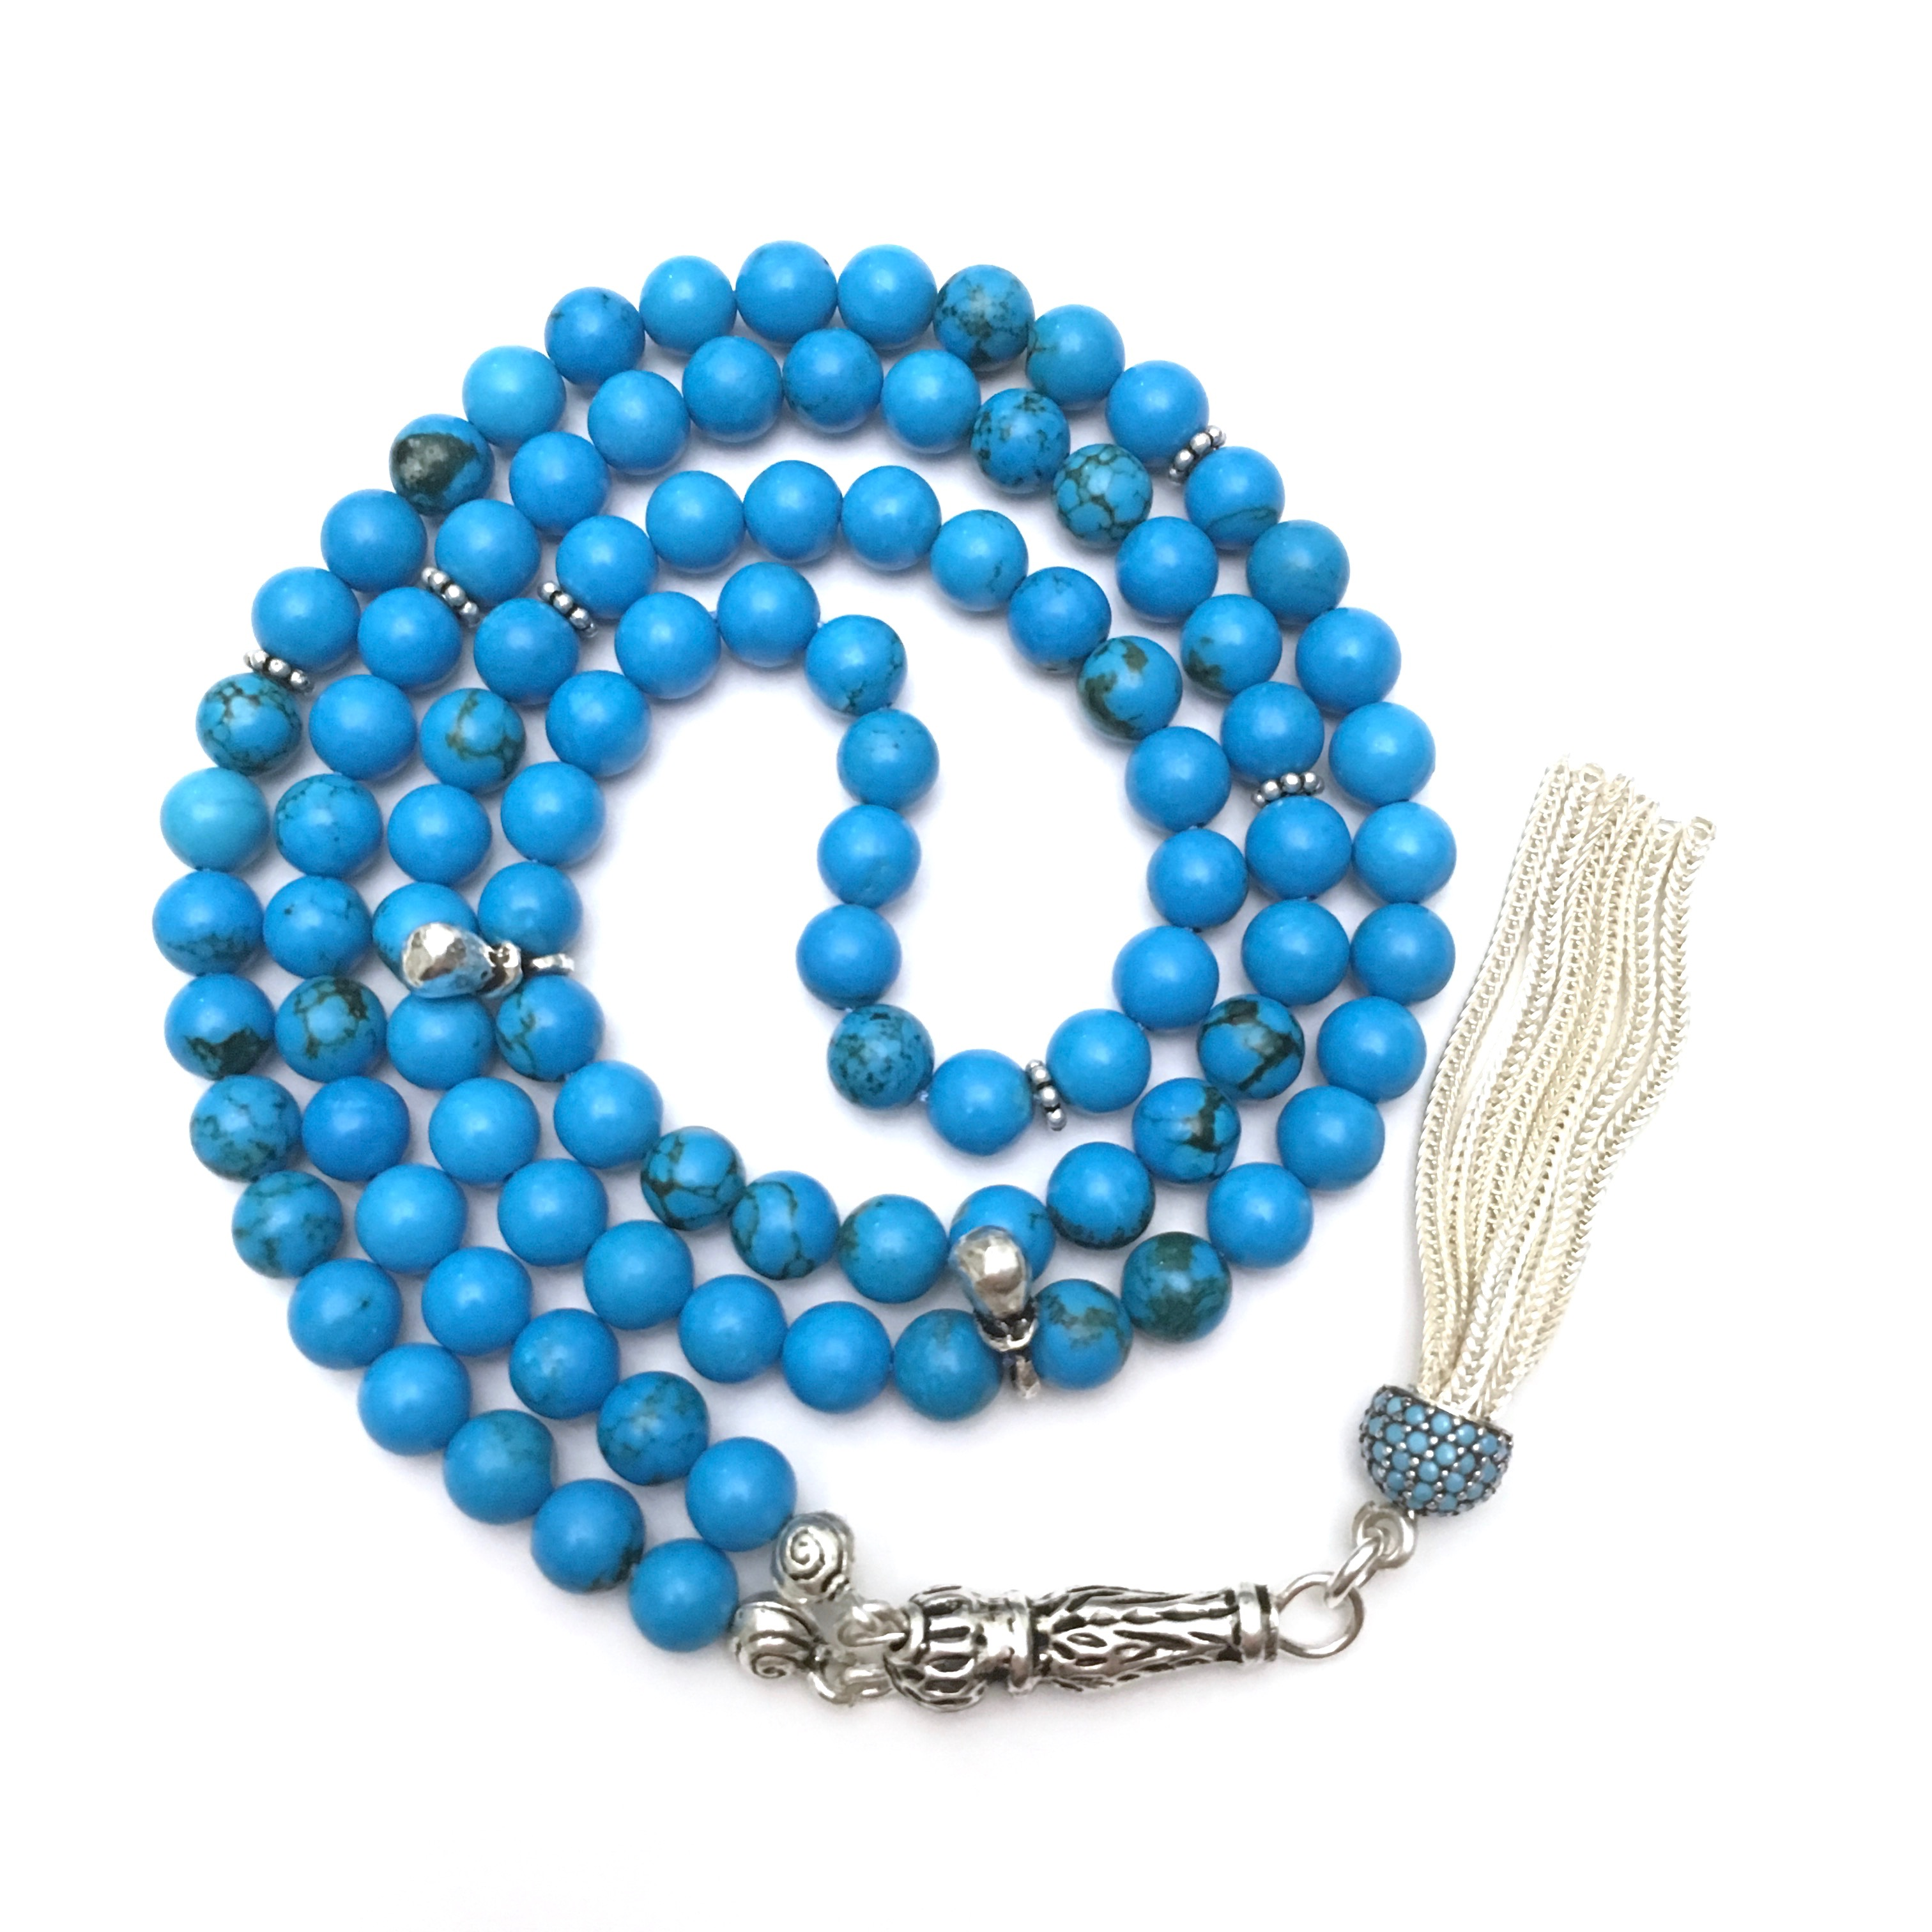 Islamic Prayer Beads 99 Howlite Tasbih sterling silver